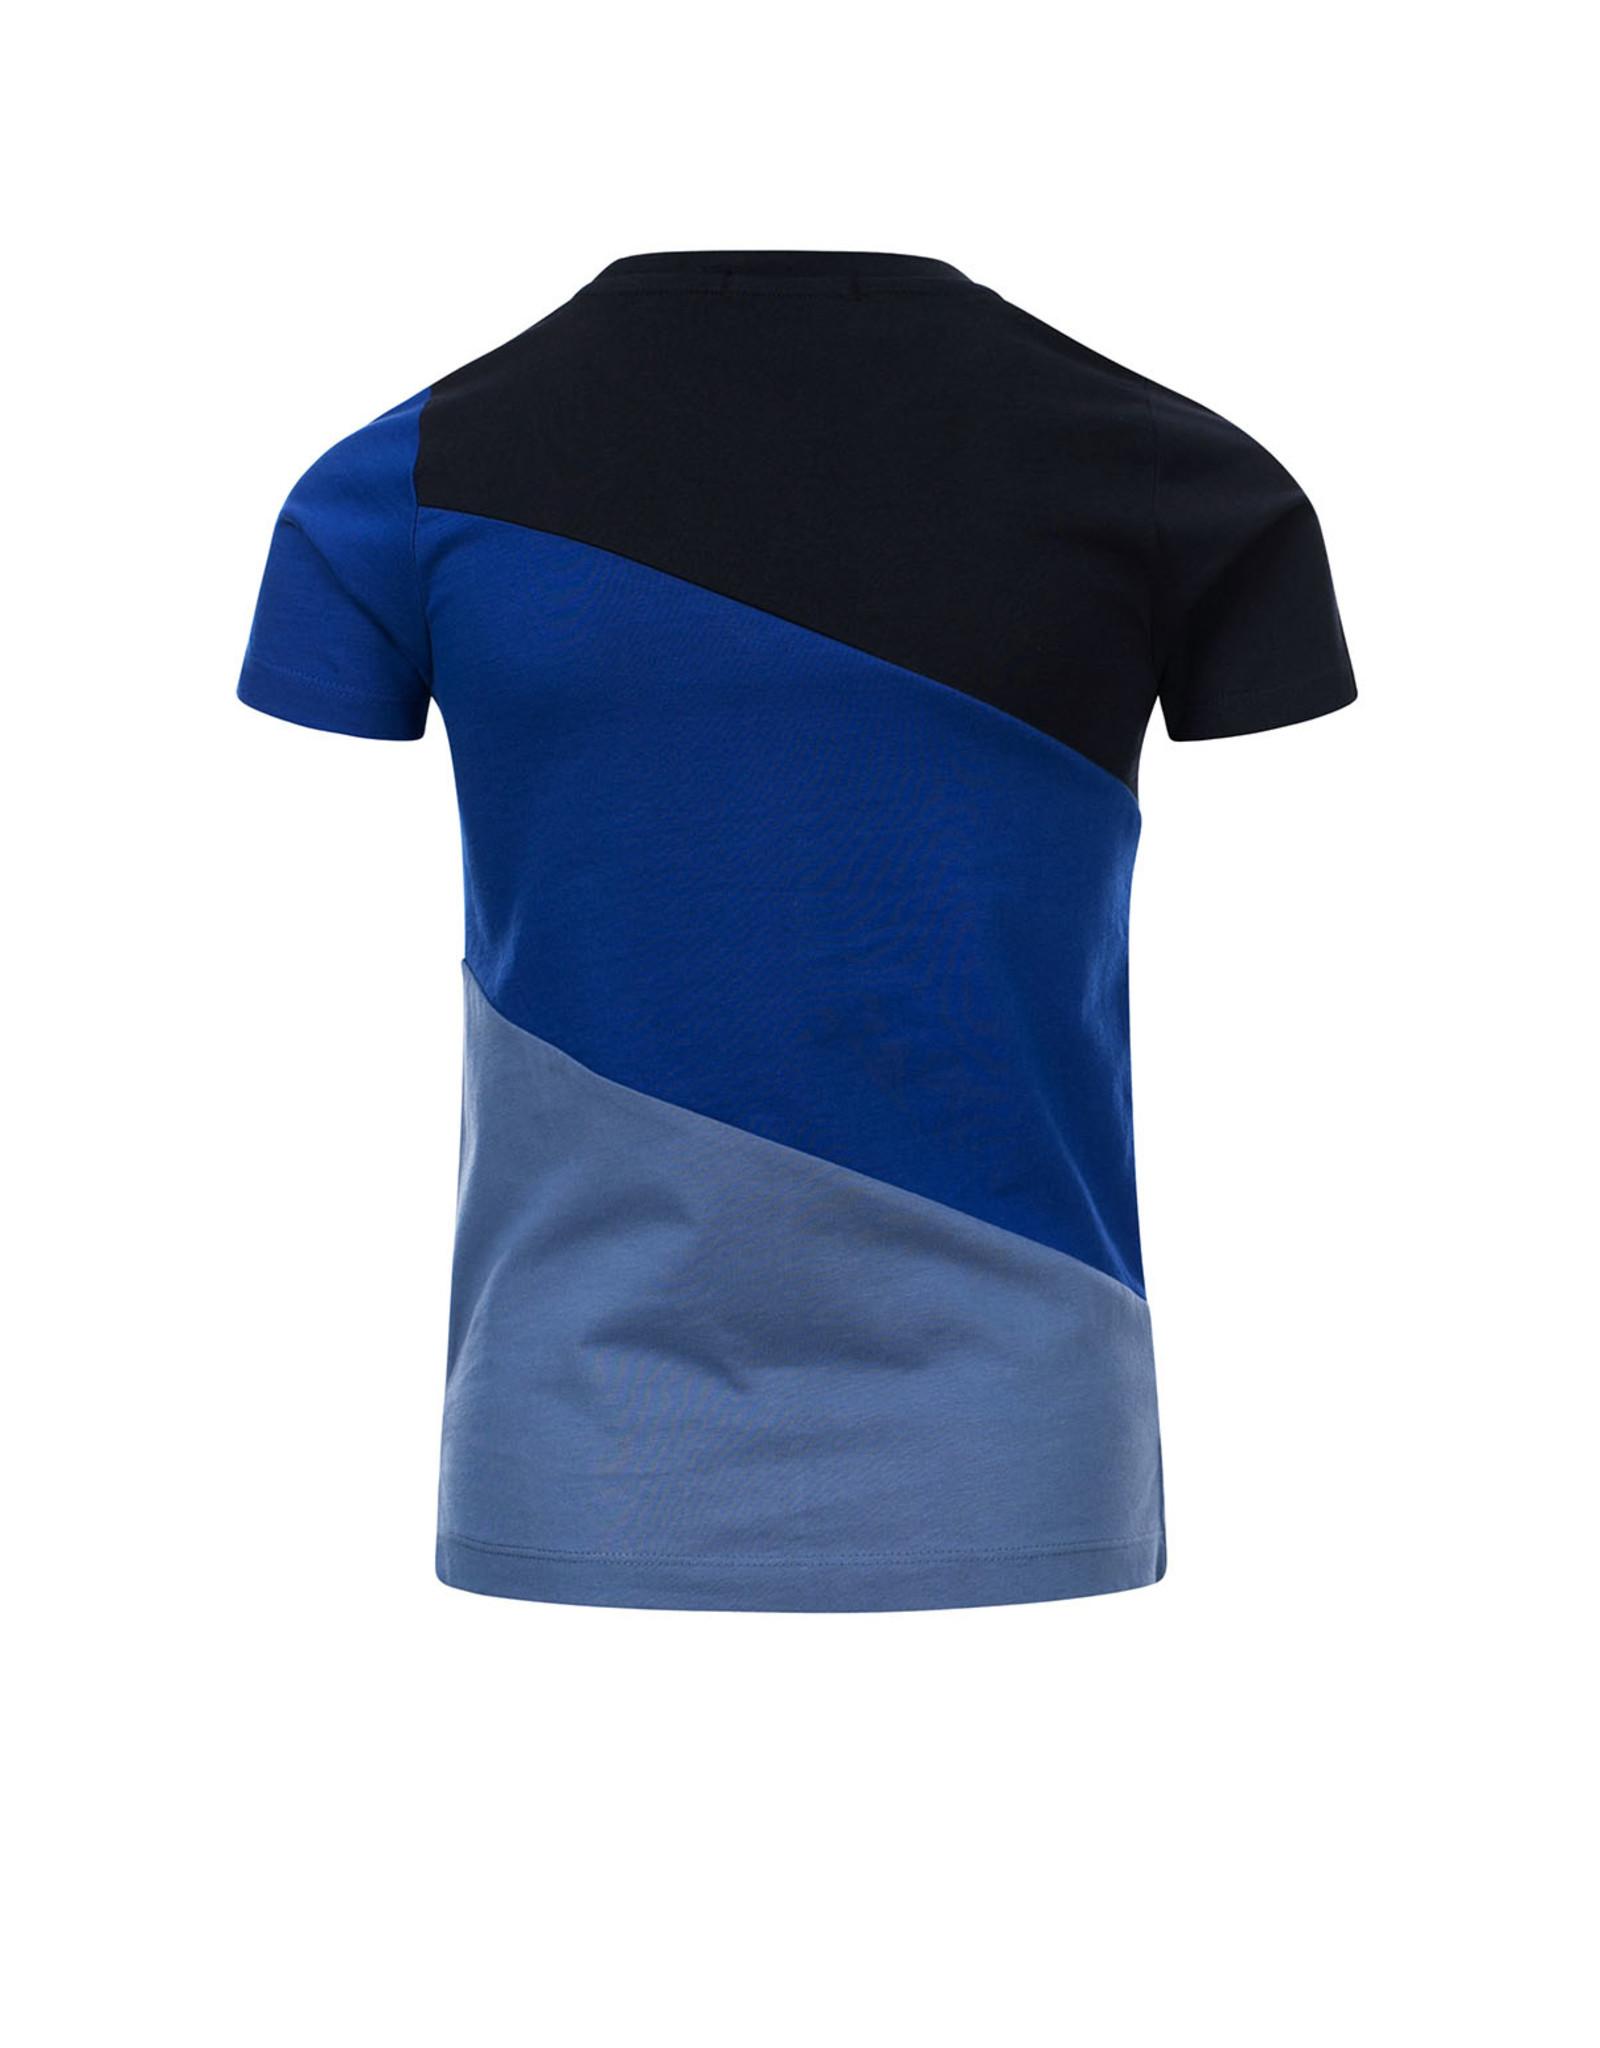 Common Heroes TIM T-shirt kobalt